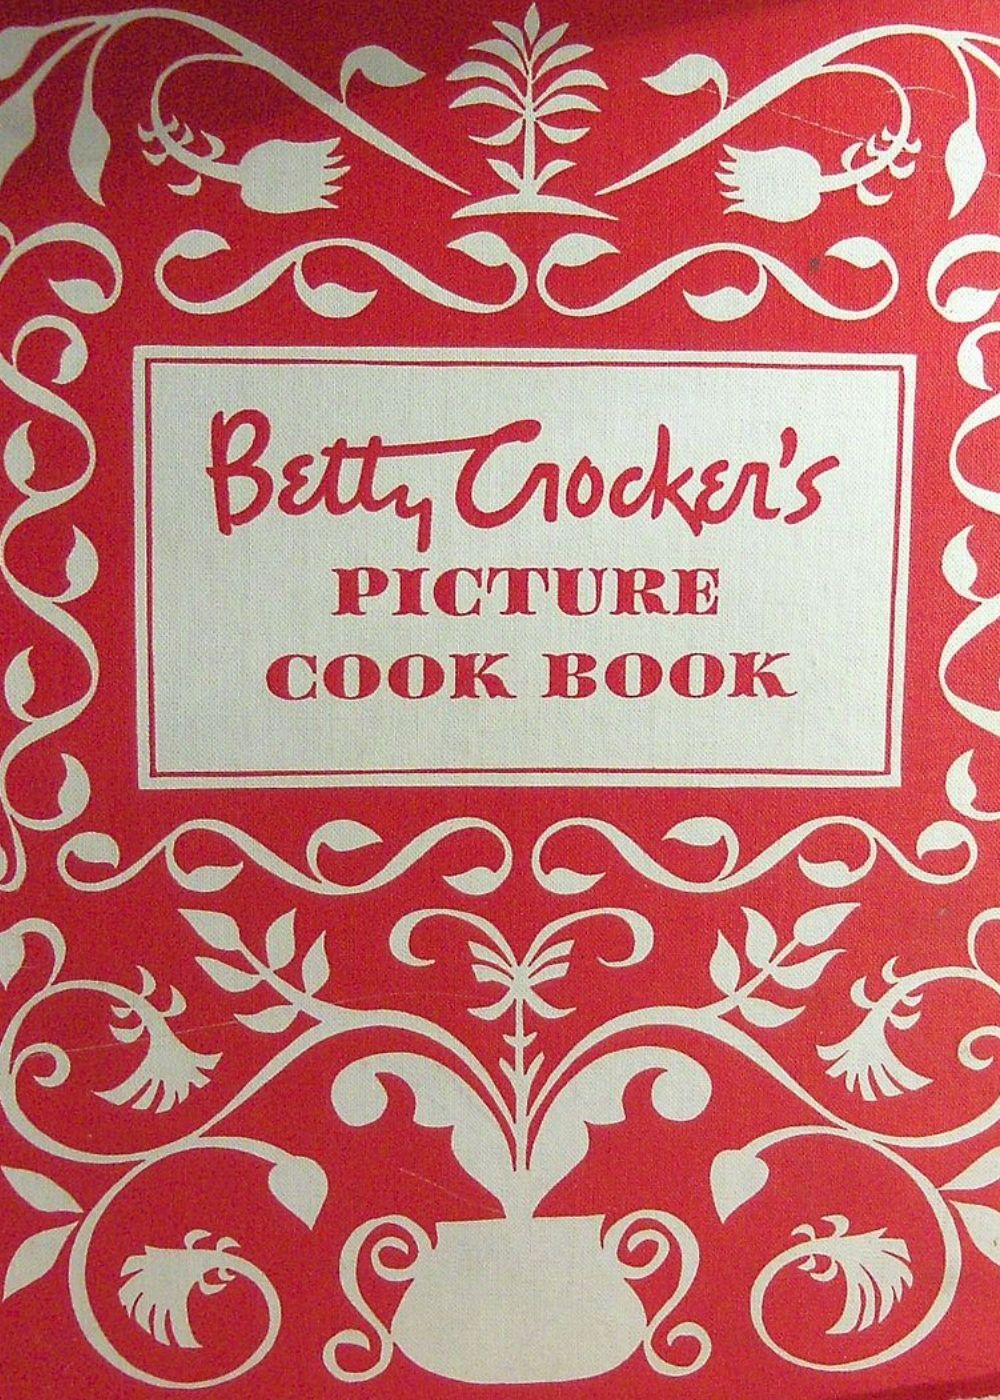 betty crocker s picture cook book 1950 s mom s favorite cookbook recipes